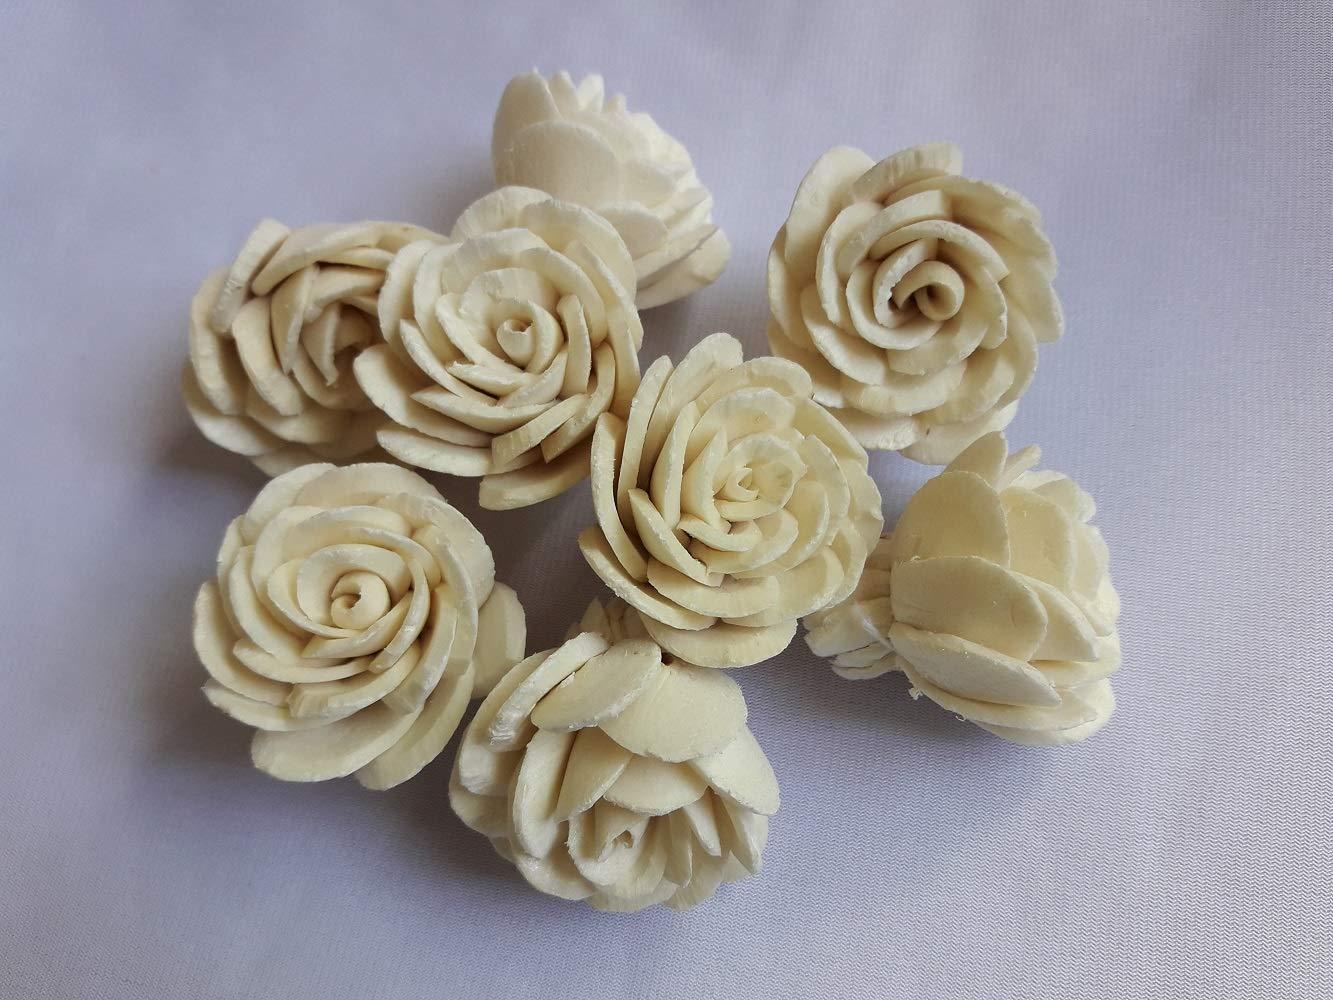 Jikkolumlukka 100 pcs. Rose Flowers Sola Balsa Wood Diffuser Craft Decor Home Fragrance Bouquet Bride Gift 4Cm by Jikkolumlukka